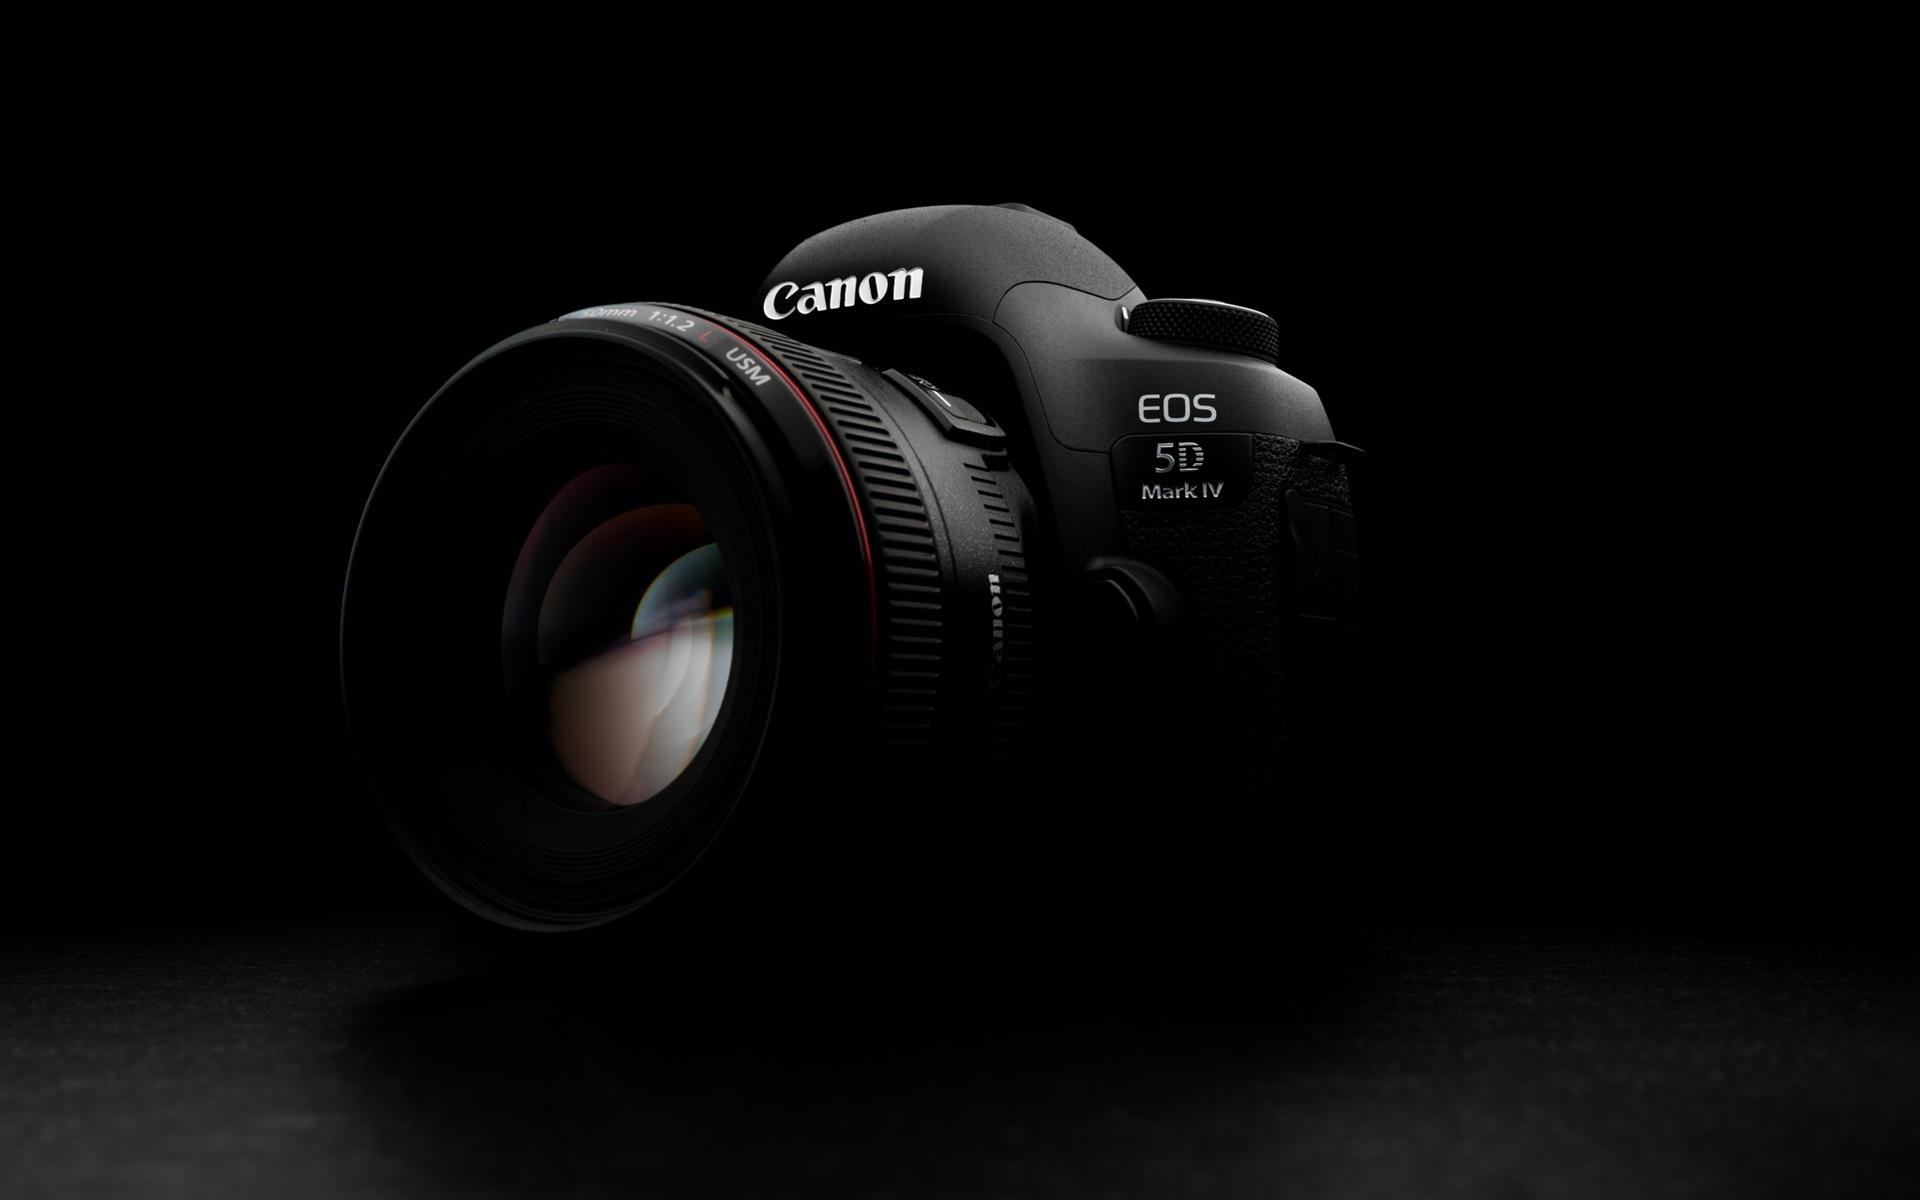 Canon 5D Mark IV Kamera Body in Berlin mieten ab 46€ pro Tag